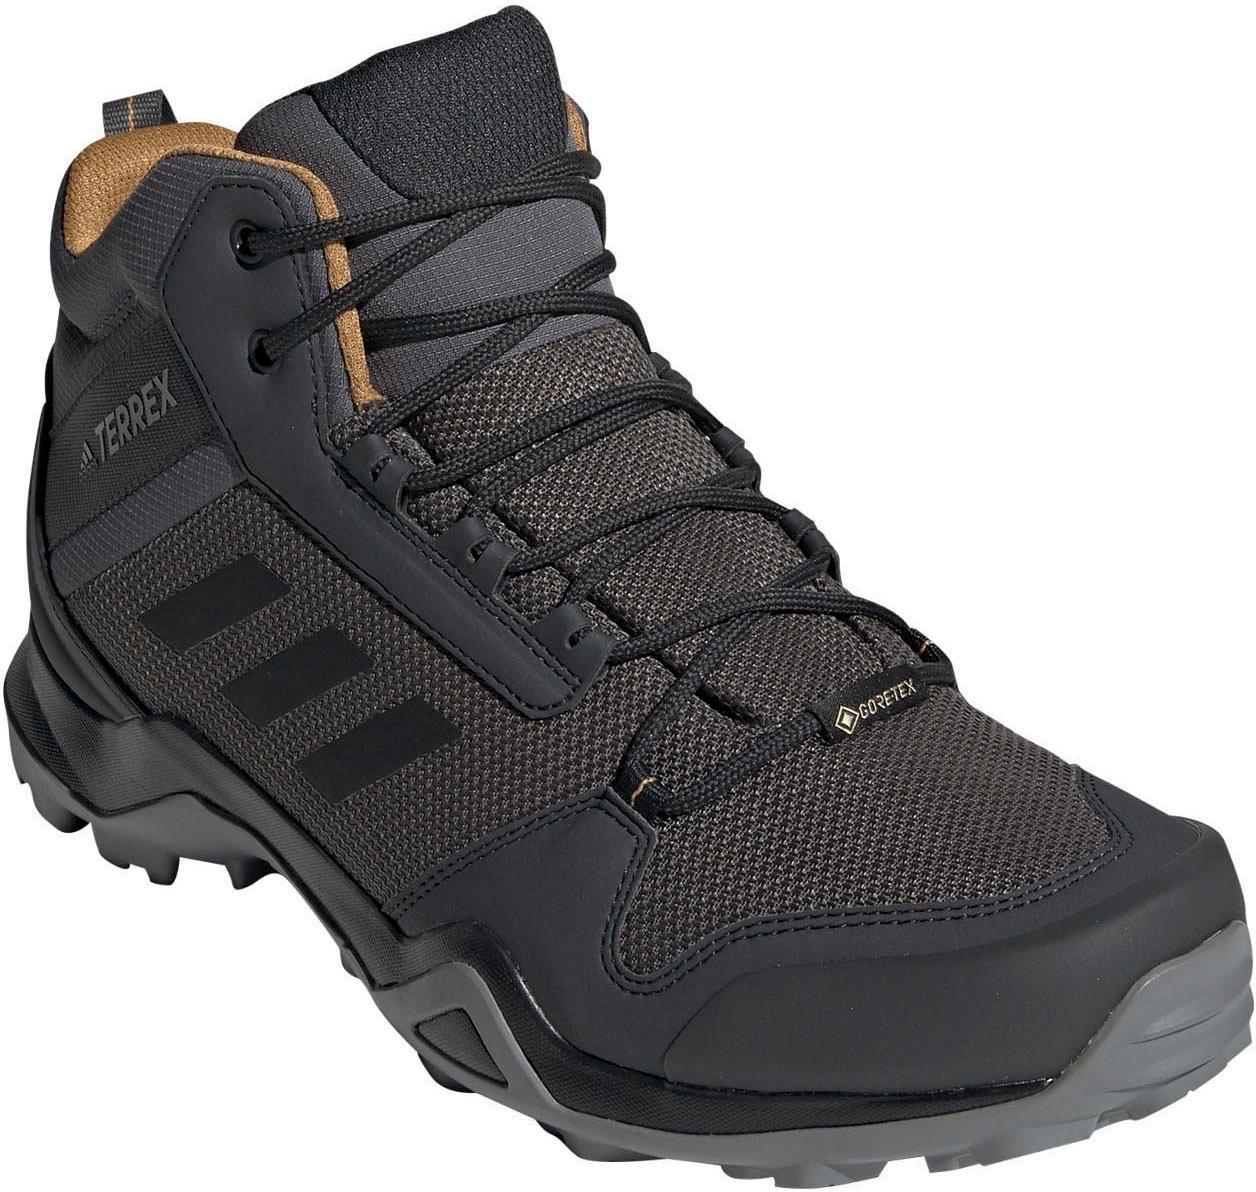 adidas Performance outdoorschoenen »TERREX AX3 MID Goretex« veilig op otto.nl kopen